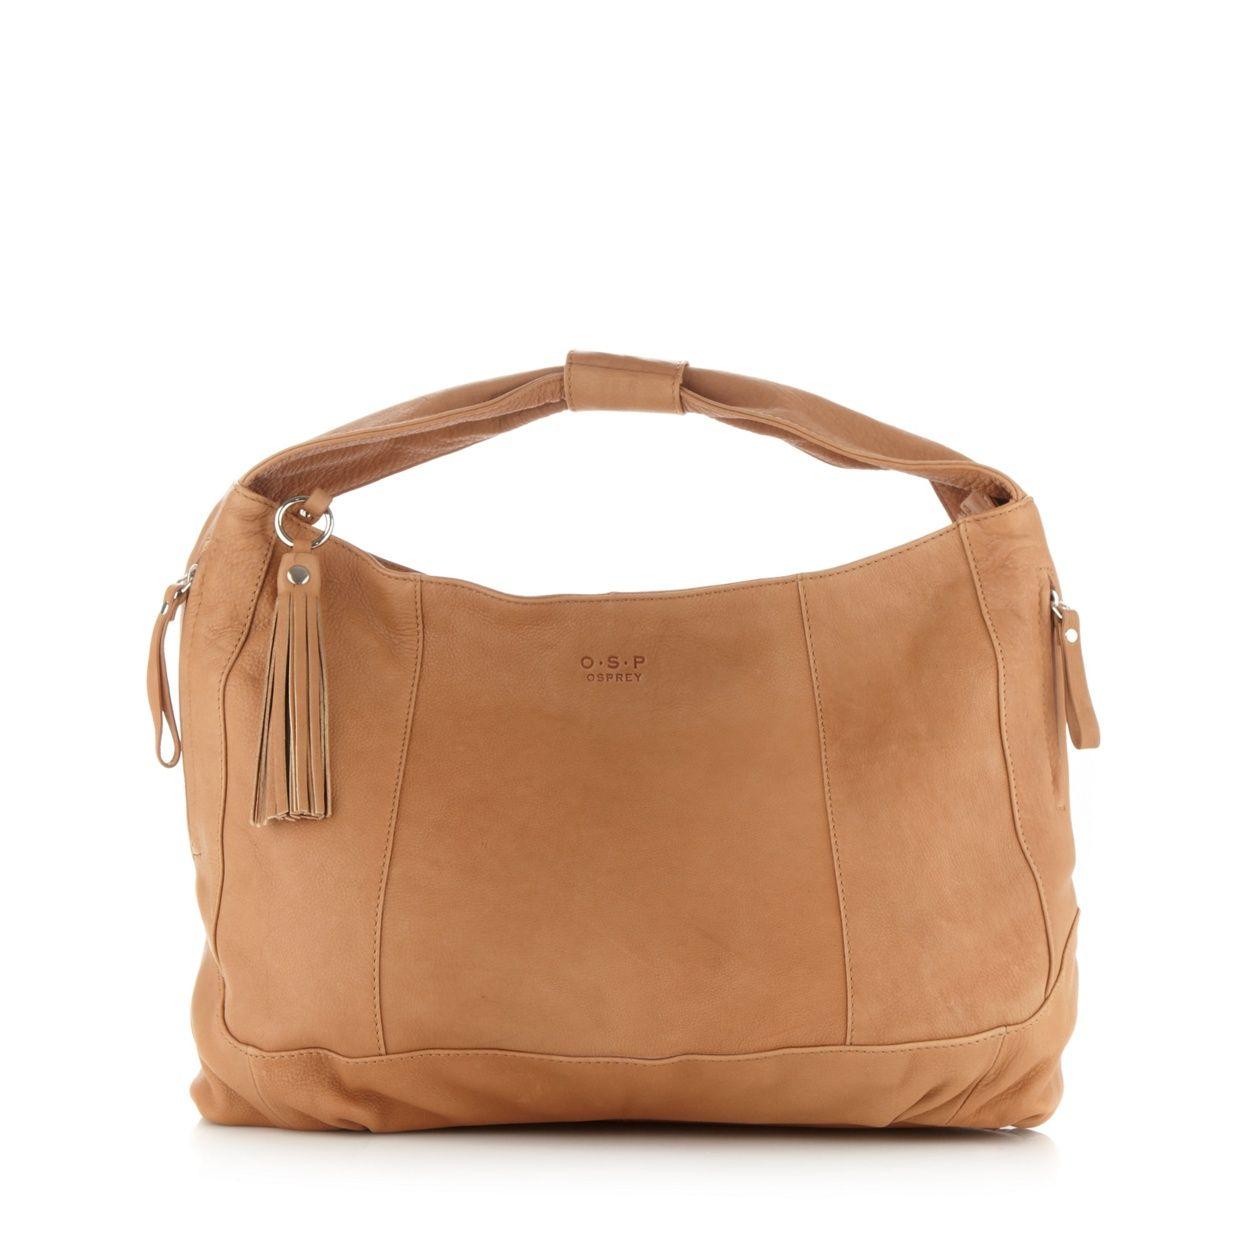 Osprey womens leather gloves - O S P Osprey Tan Large Soft Leather Hobo Bag At Debenhams Com